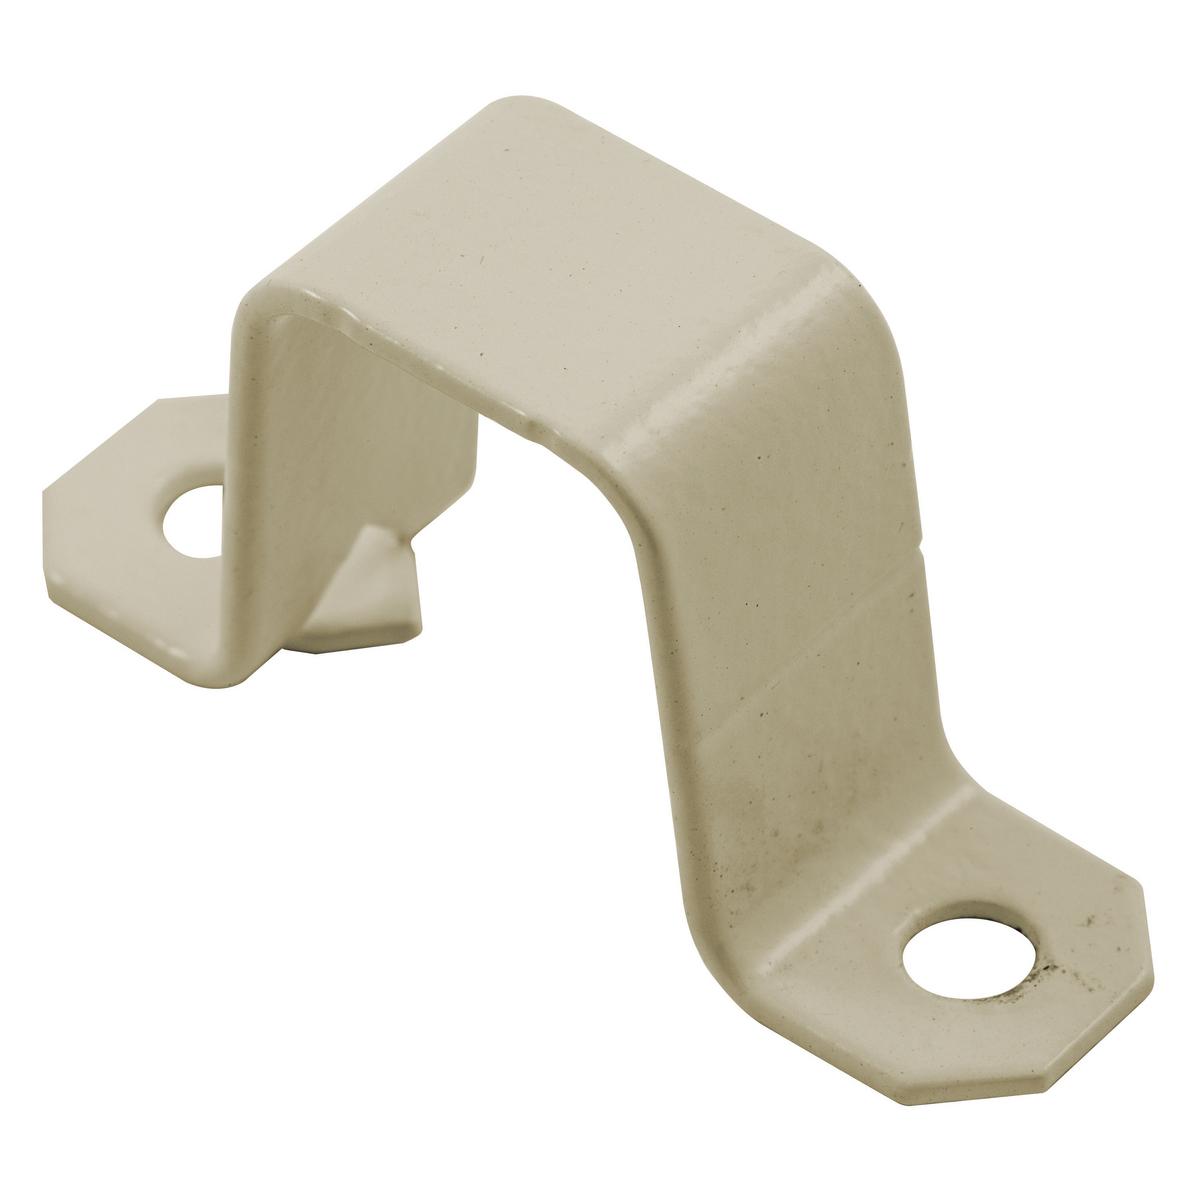 MOUNTING STRAP HBL750 IV